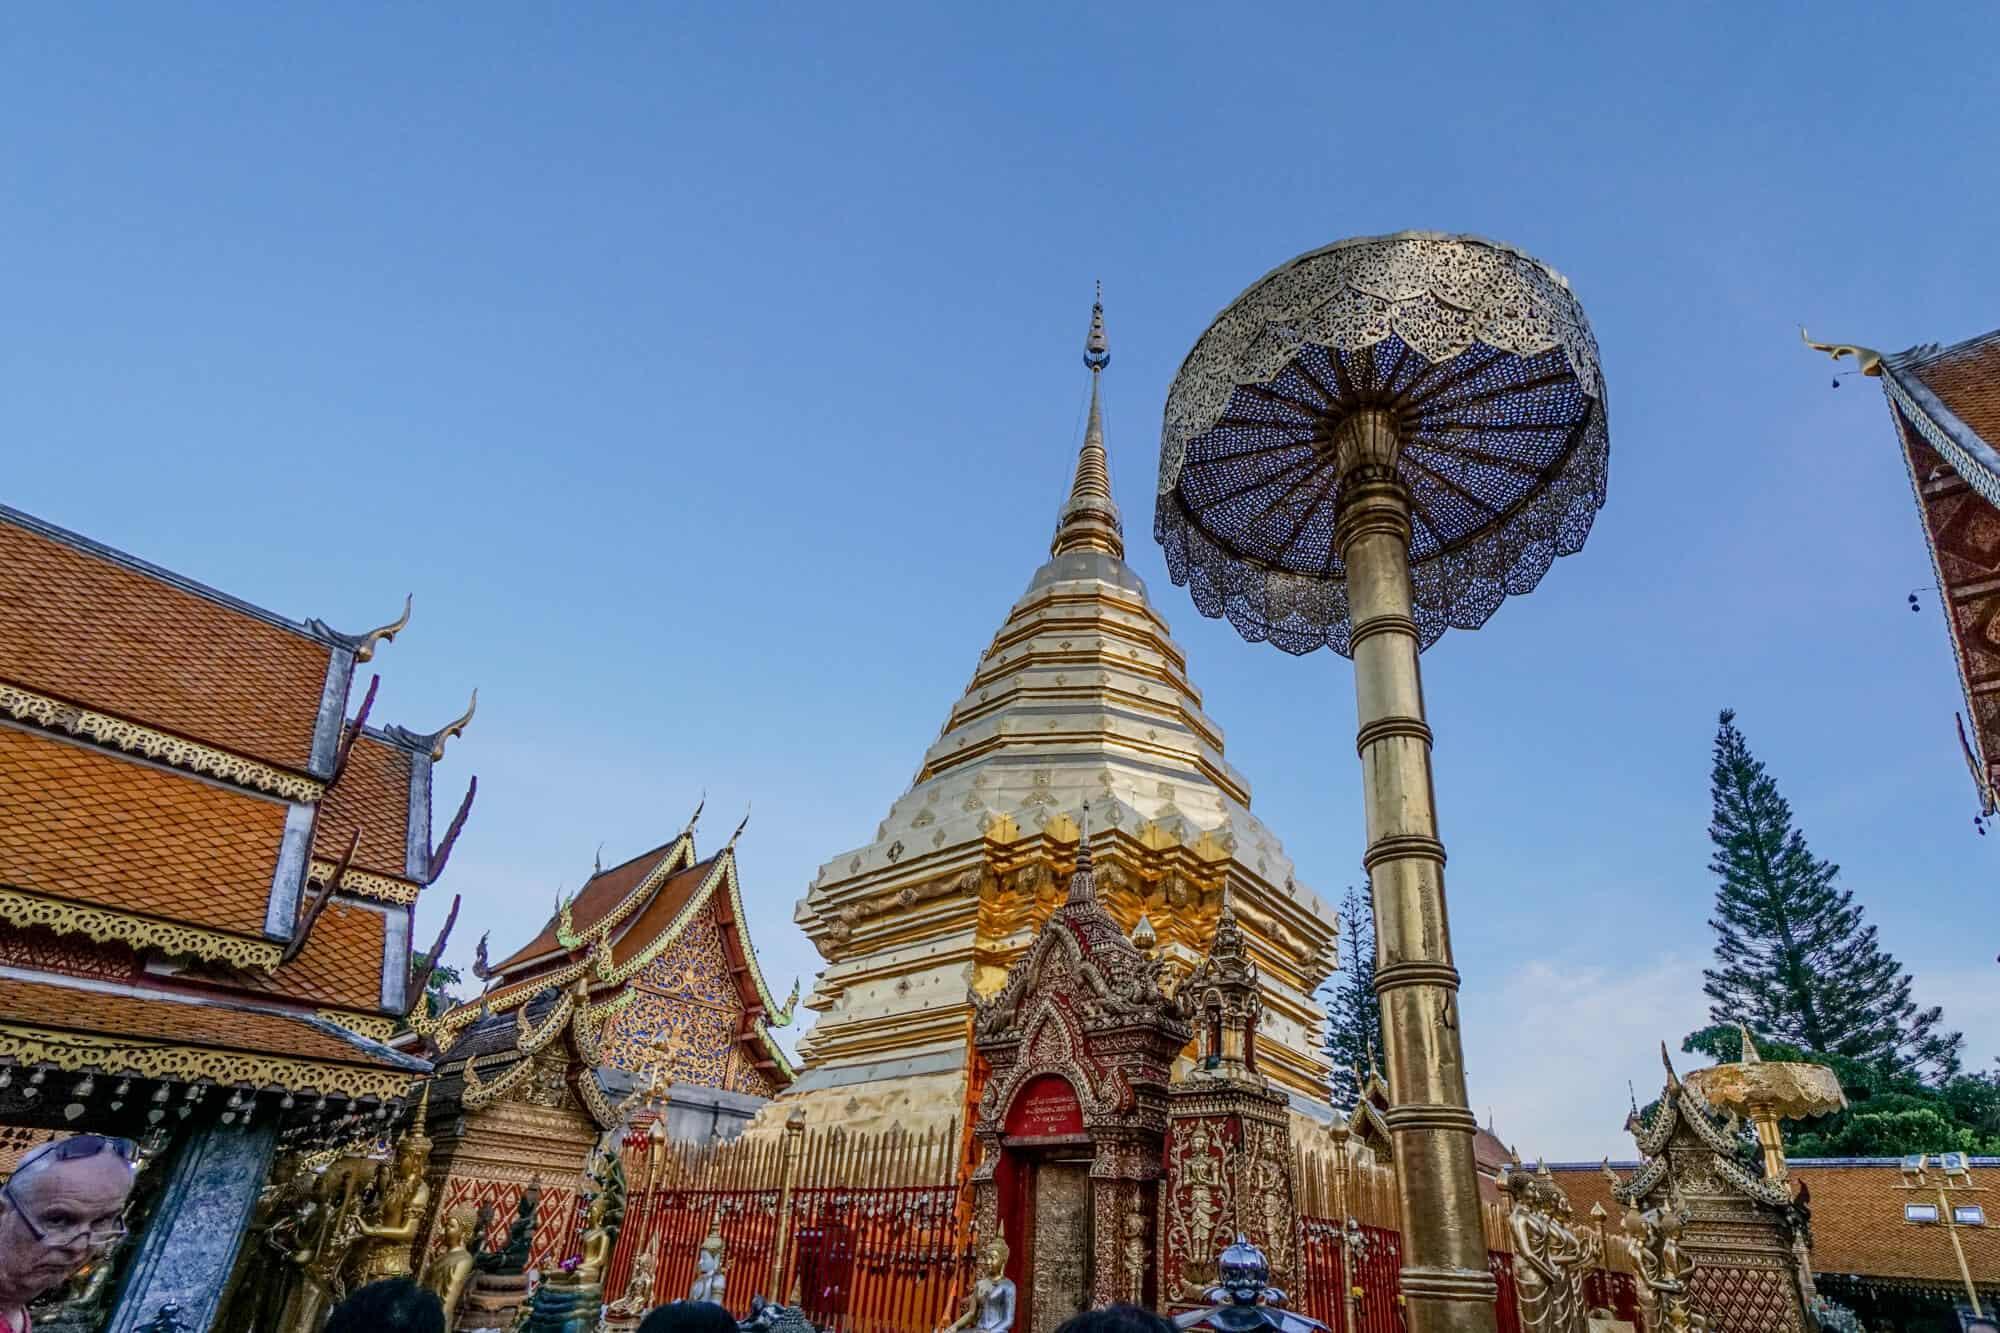 Wat Phra That Doi Suthep Chedi